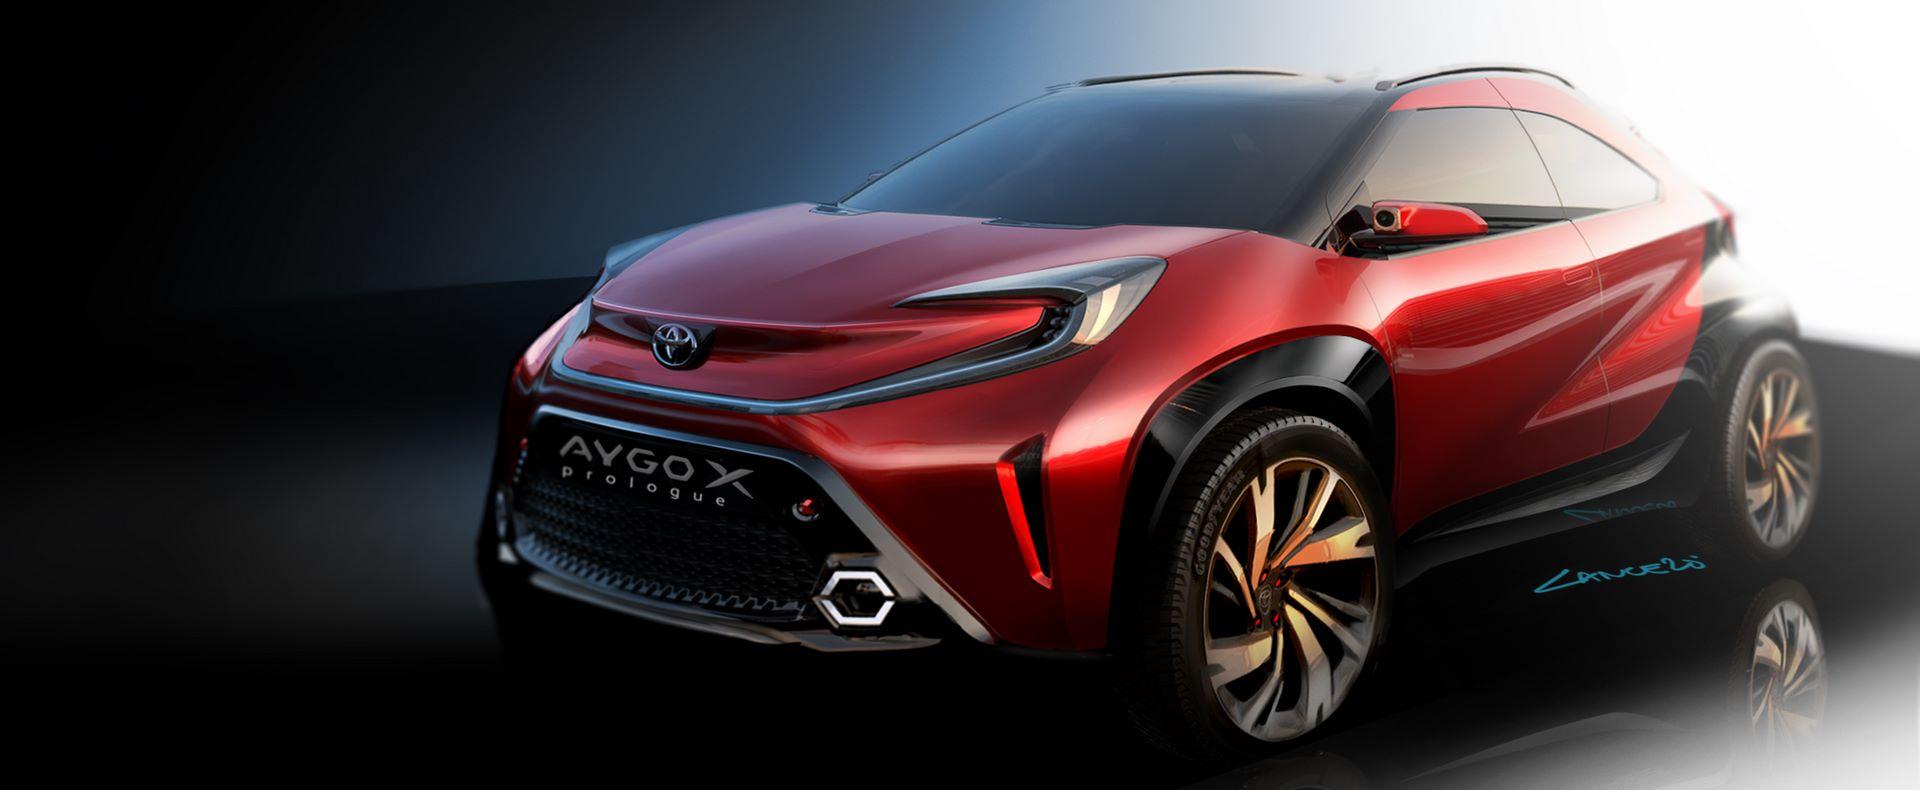 Toyota-Aygo-X-prologue-3